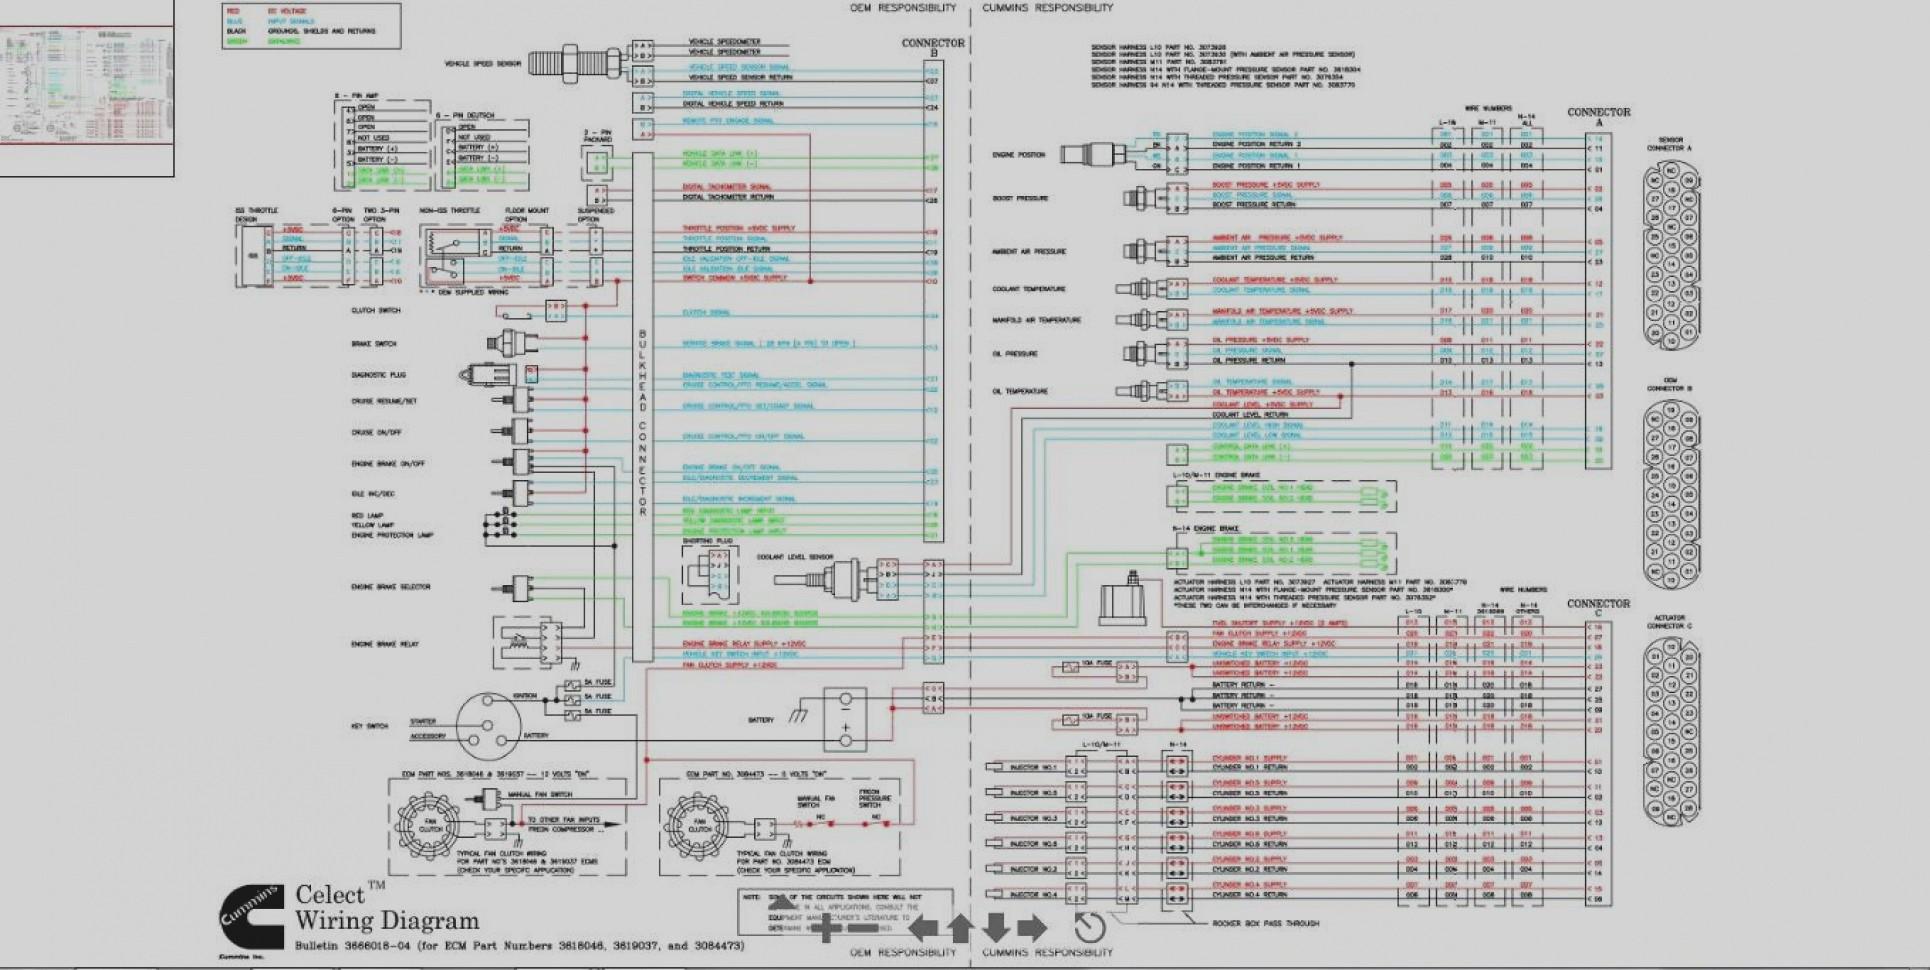 Diagram Cummins Isb Ecu Wiring Diagram Full Version Hd Quality Wiring Diagram Seemdiagram Eracleaturismo It